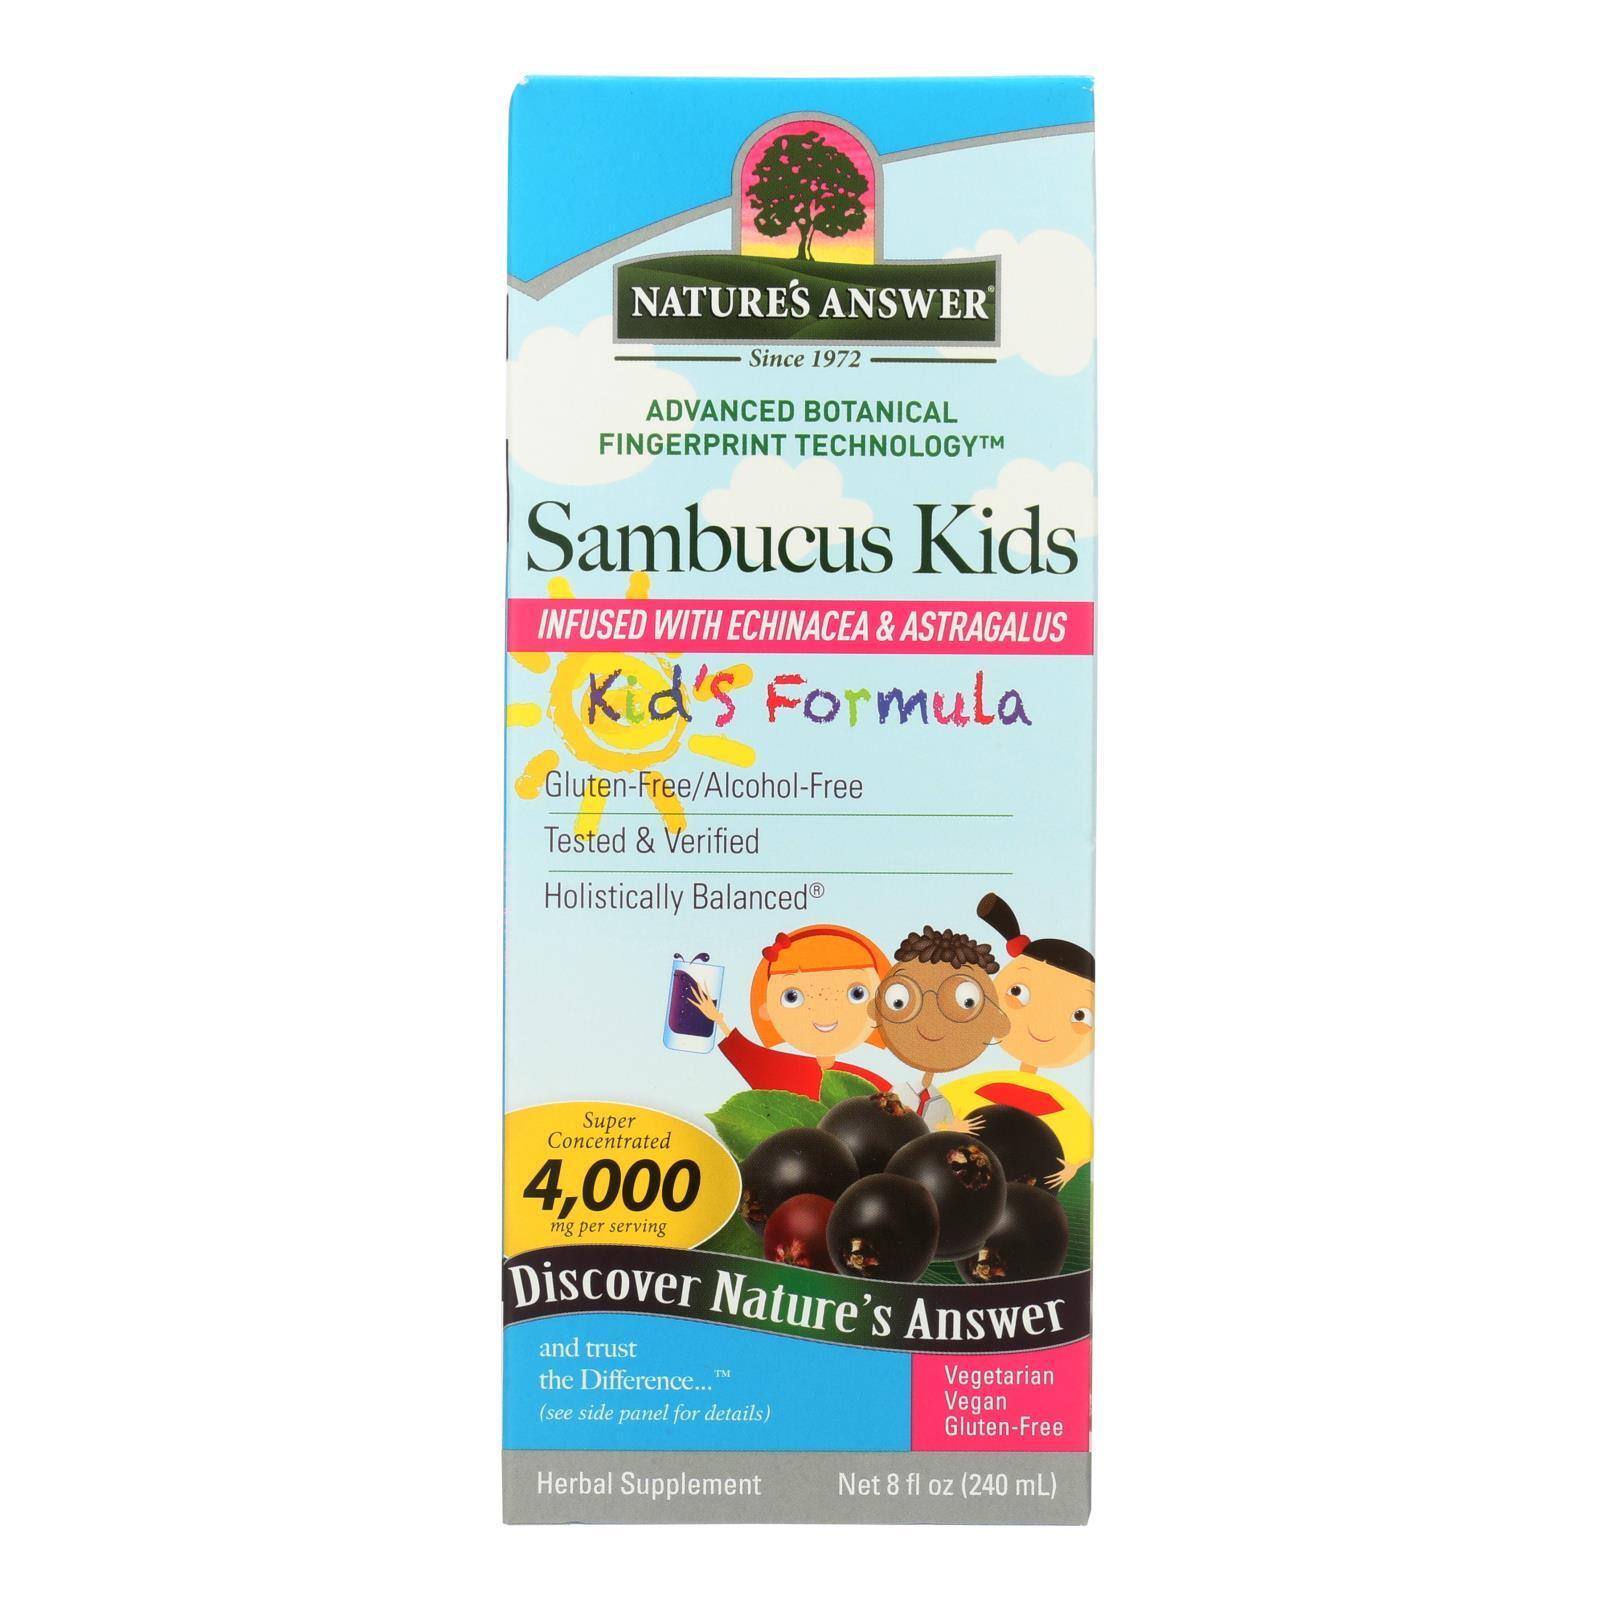 Natures Answer Sambucus - Kids Formula - Original Flavor - 8 oz